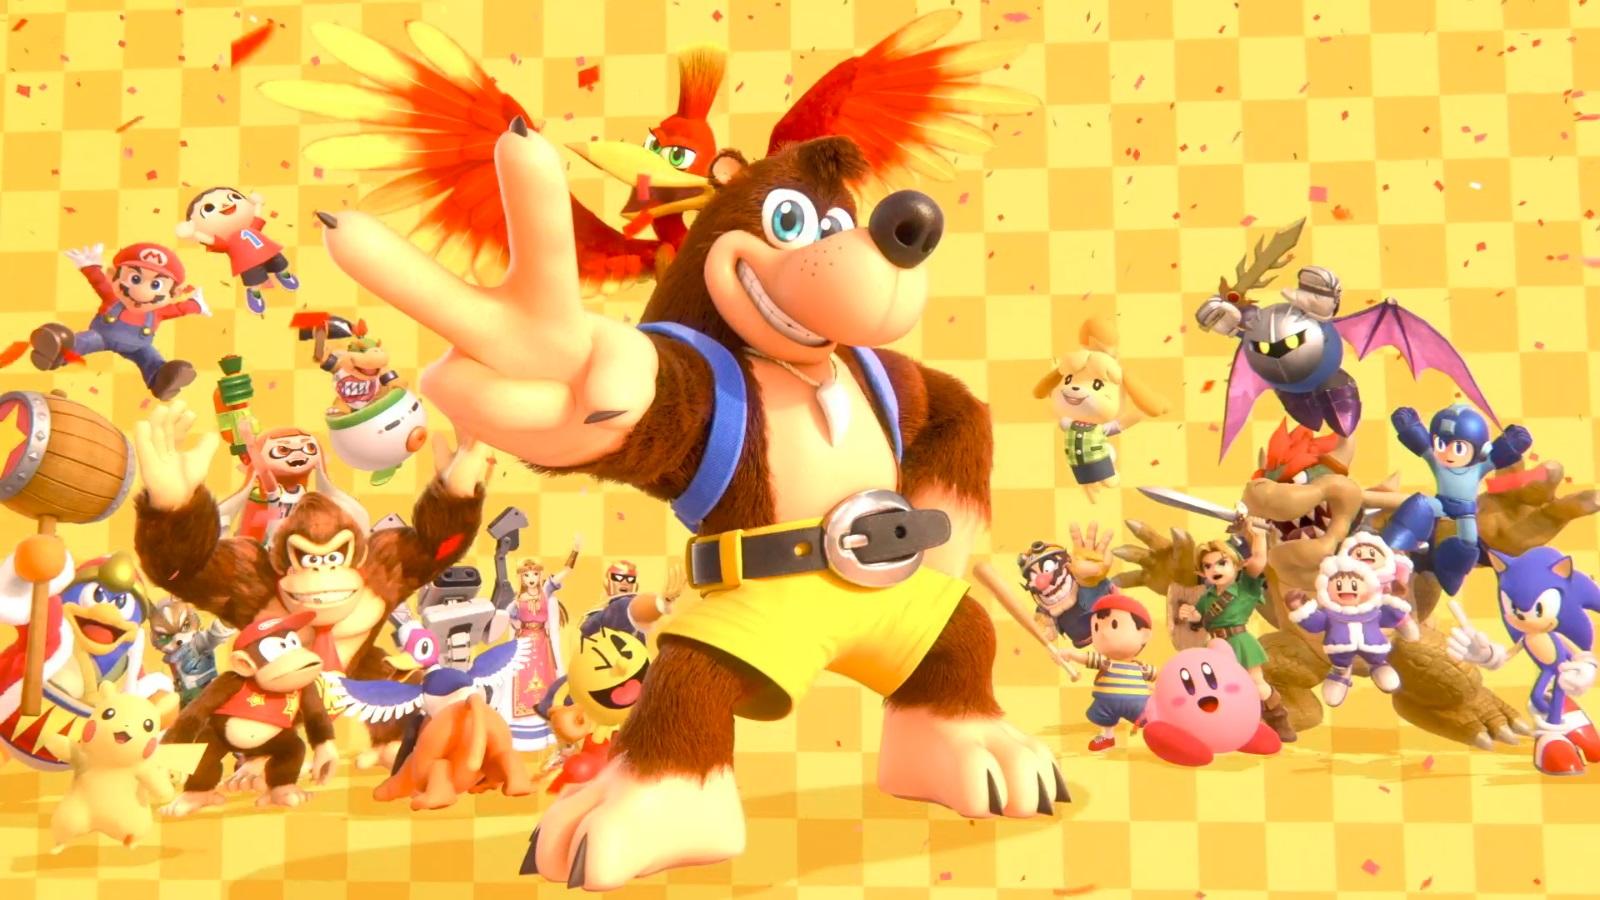 Banjo and Kazooie are coming to Super Smash Bros. Ultimate! screenshot